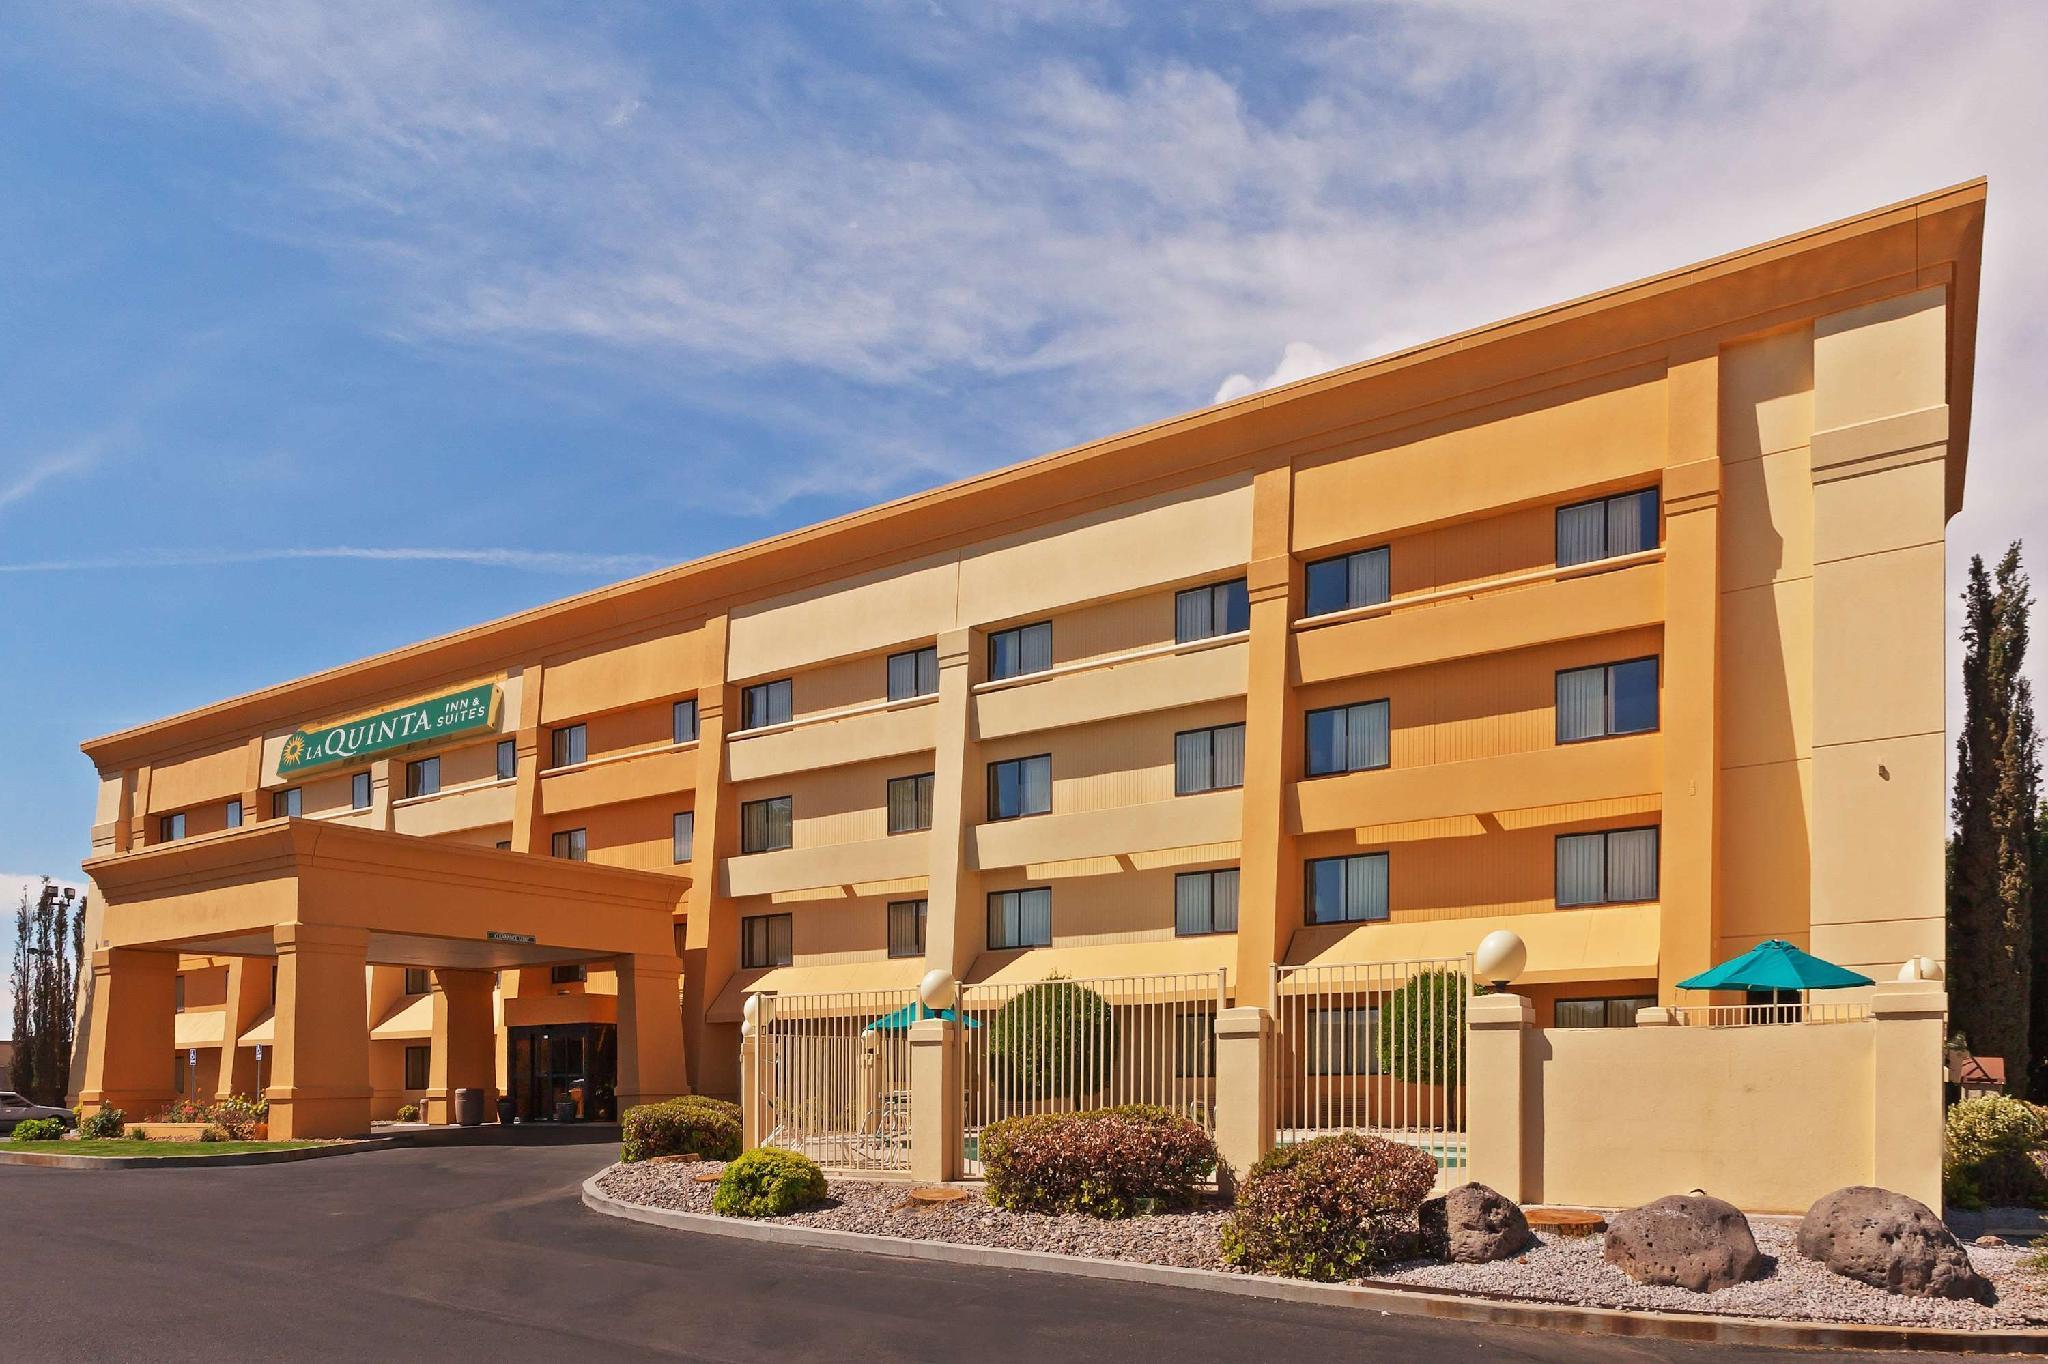 La Quinta Inn & Suites By Wyndham Las Cruces Organ Mountain